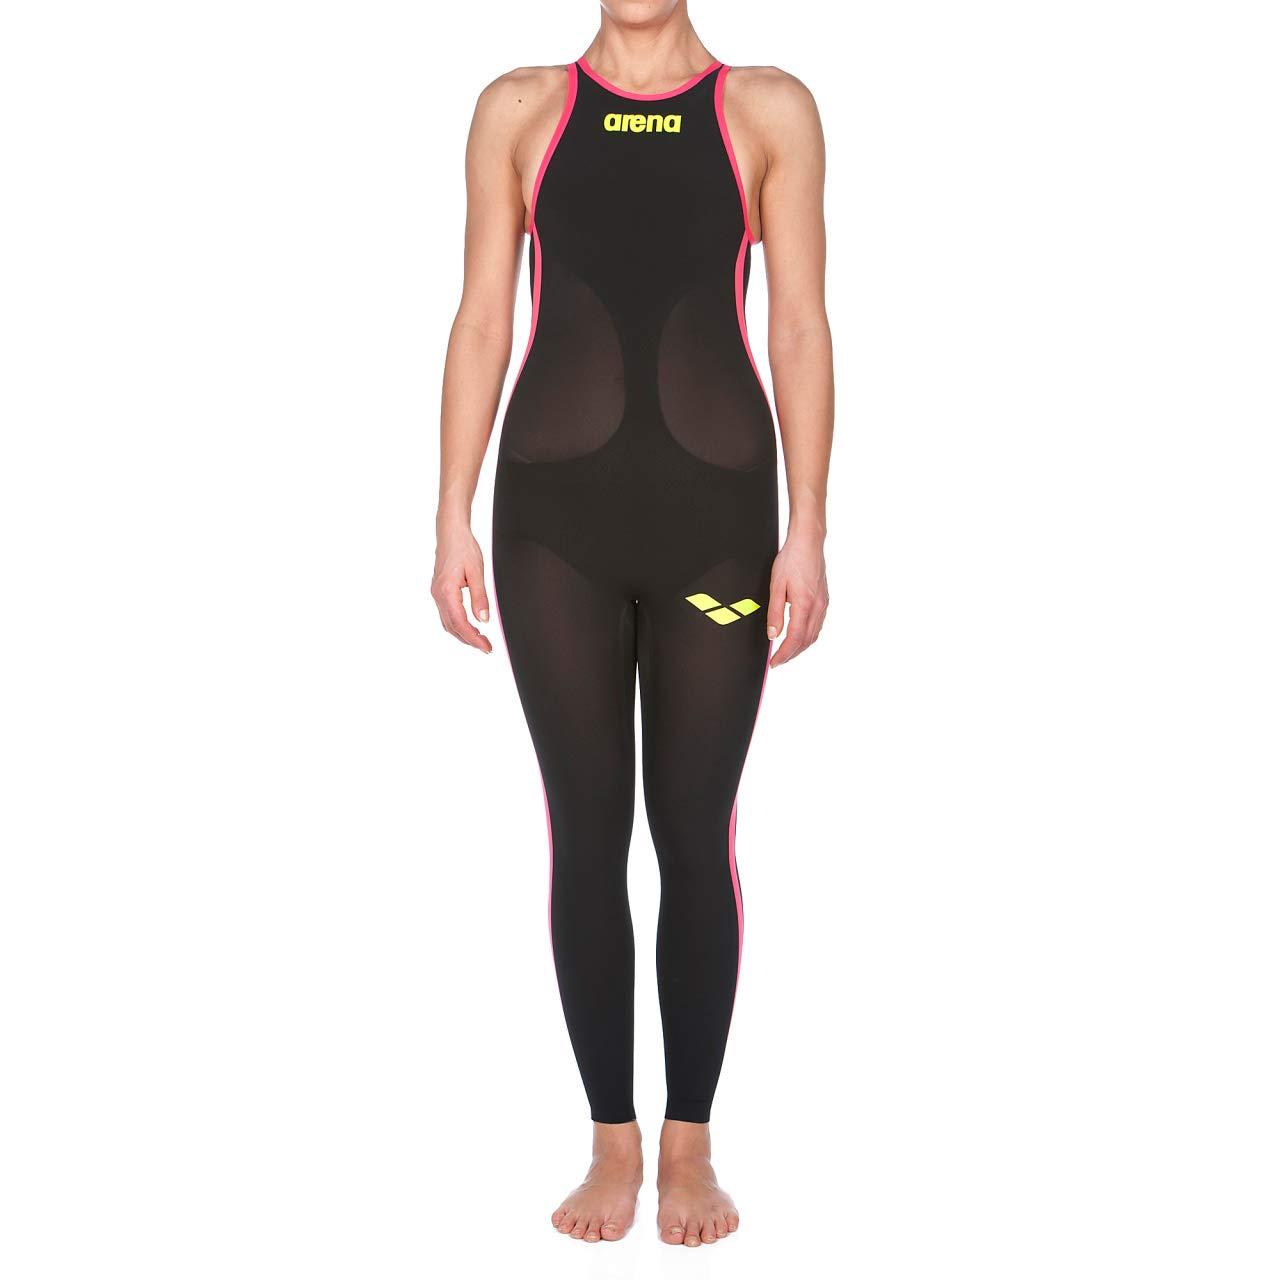 Image of ARENA Women's Powerskin R-Evo+ Ow Fbllob Dive Skins